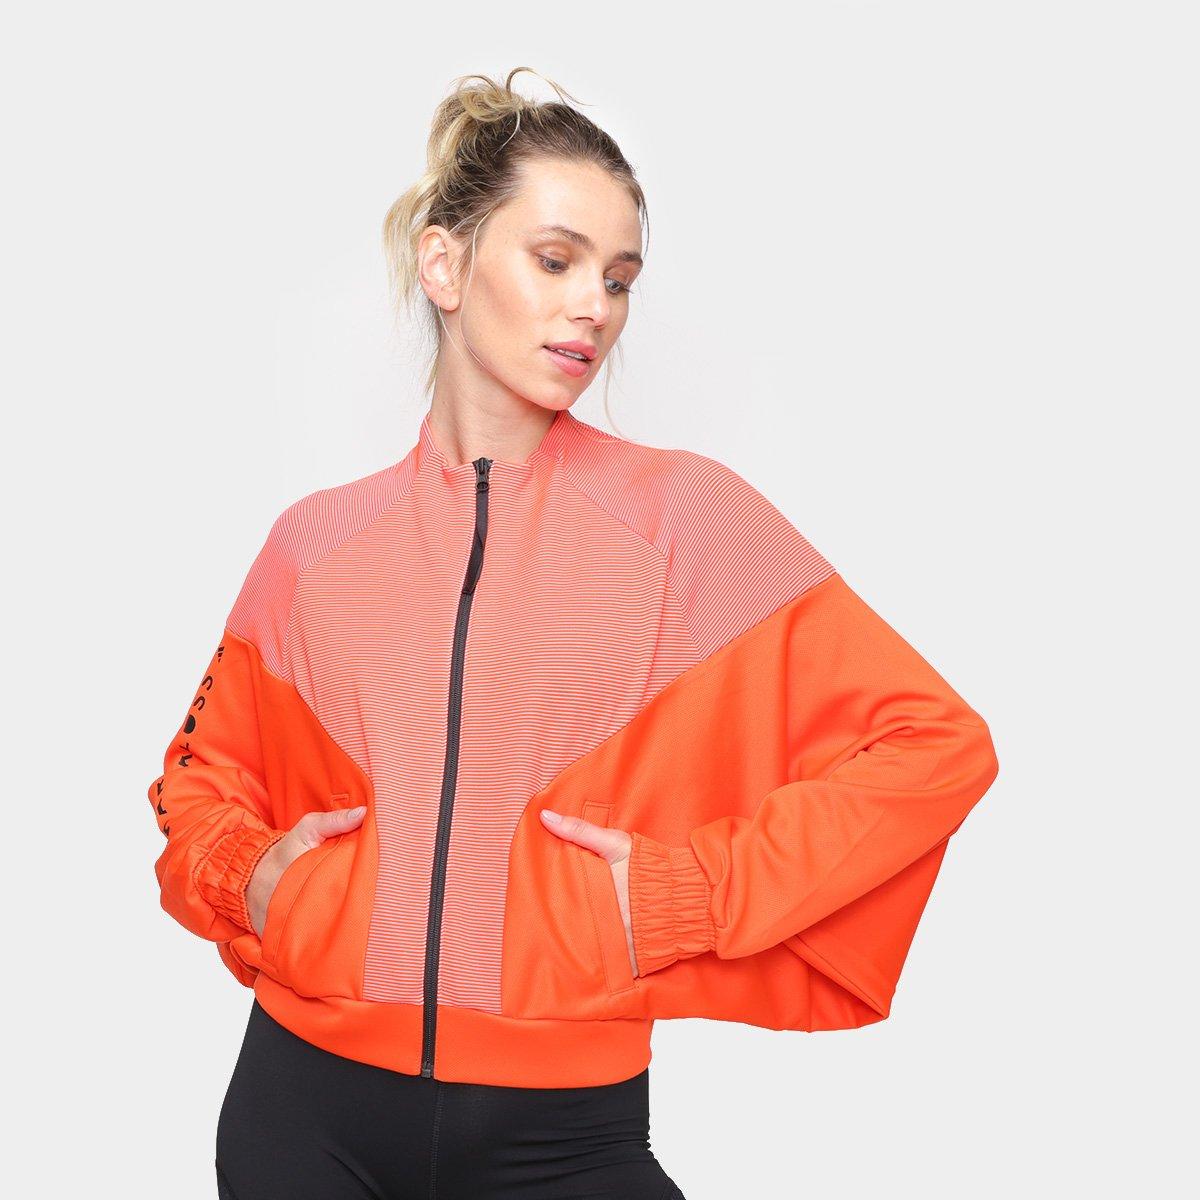 Jaqueta Adidas Cover-Up Karlie Kloss Feminina